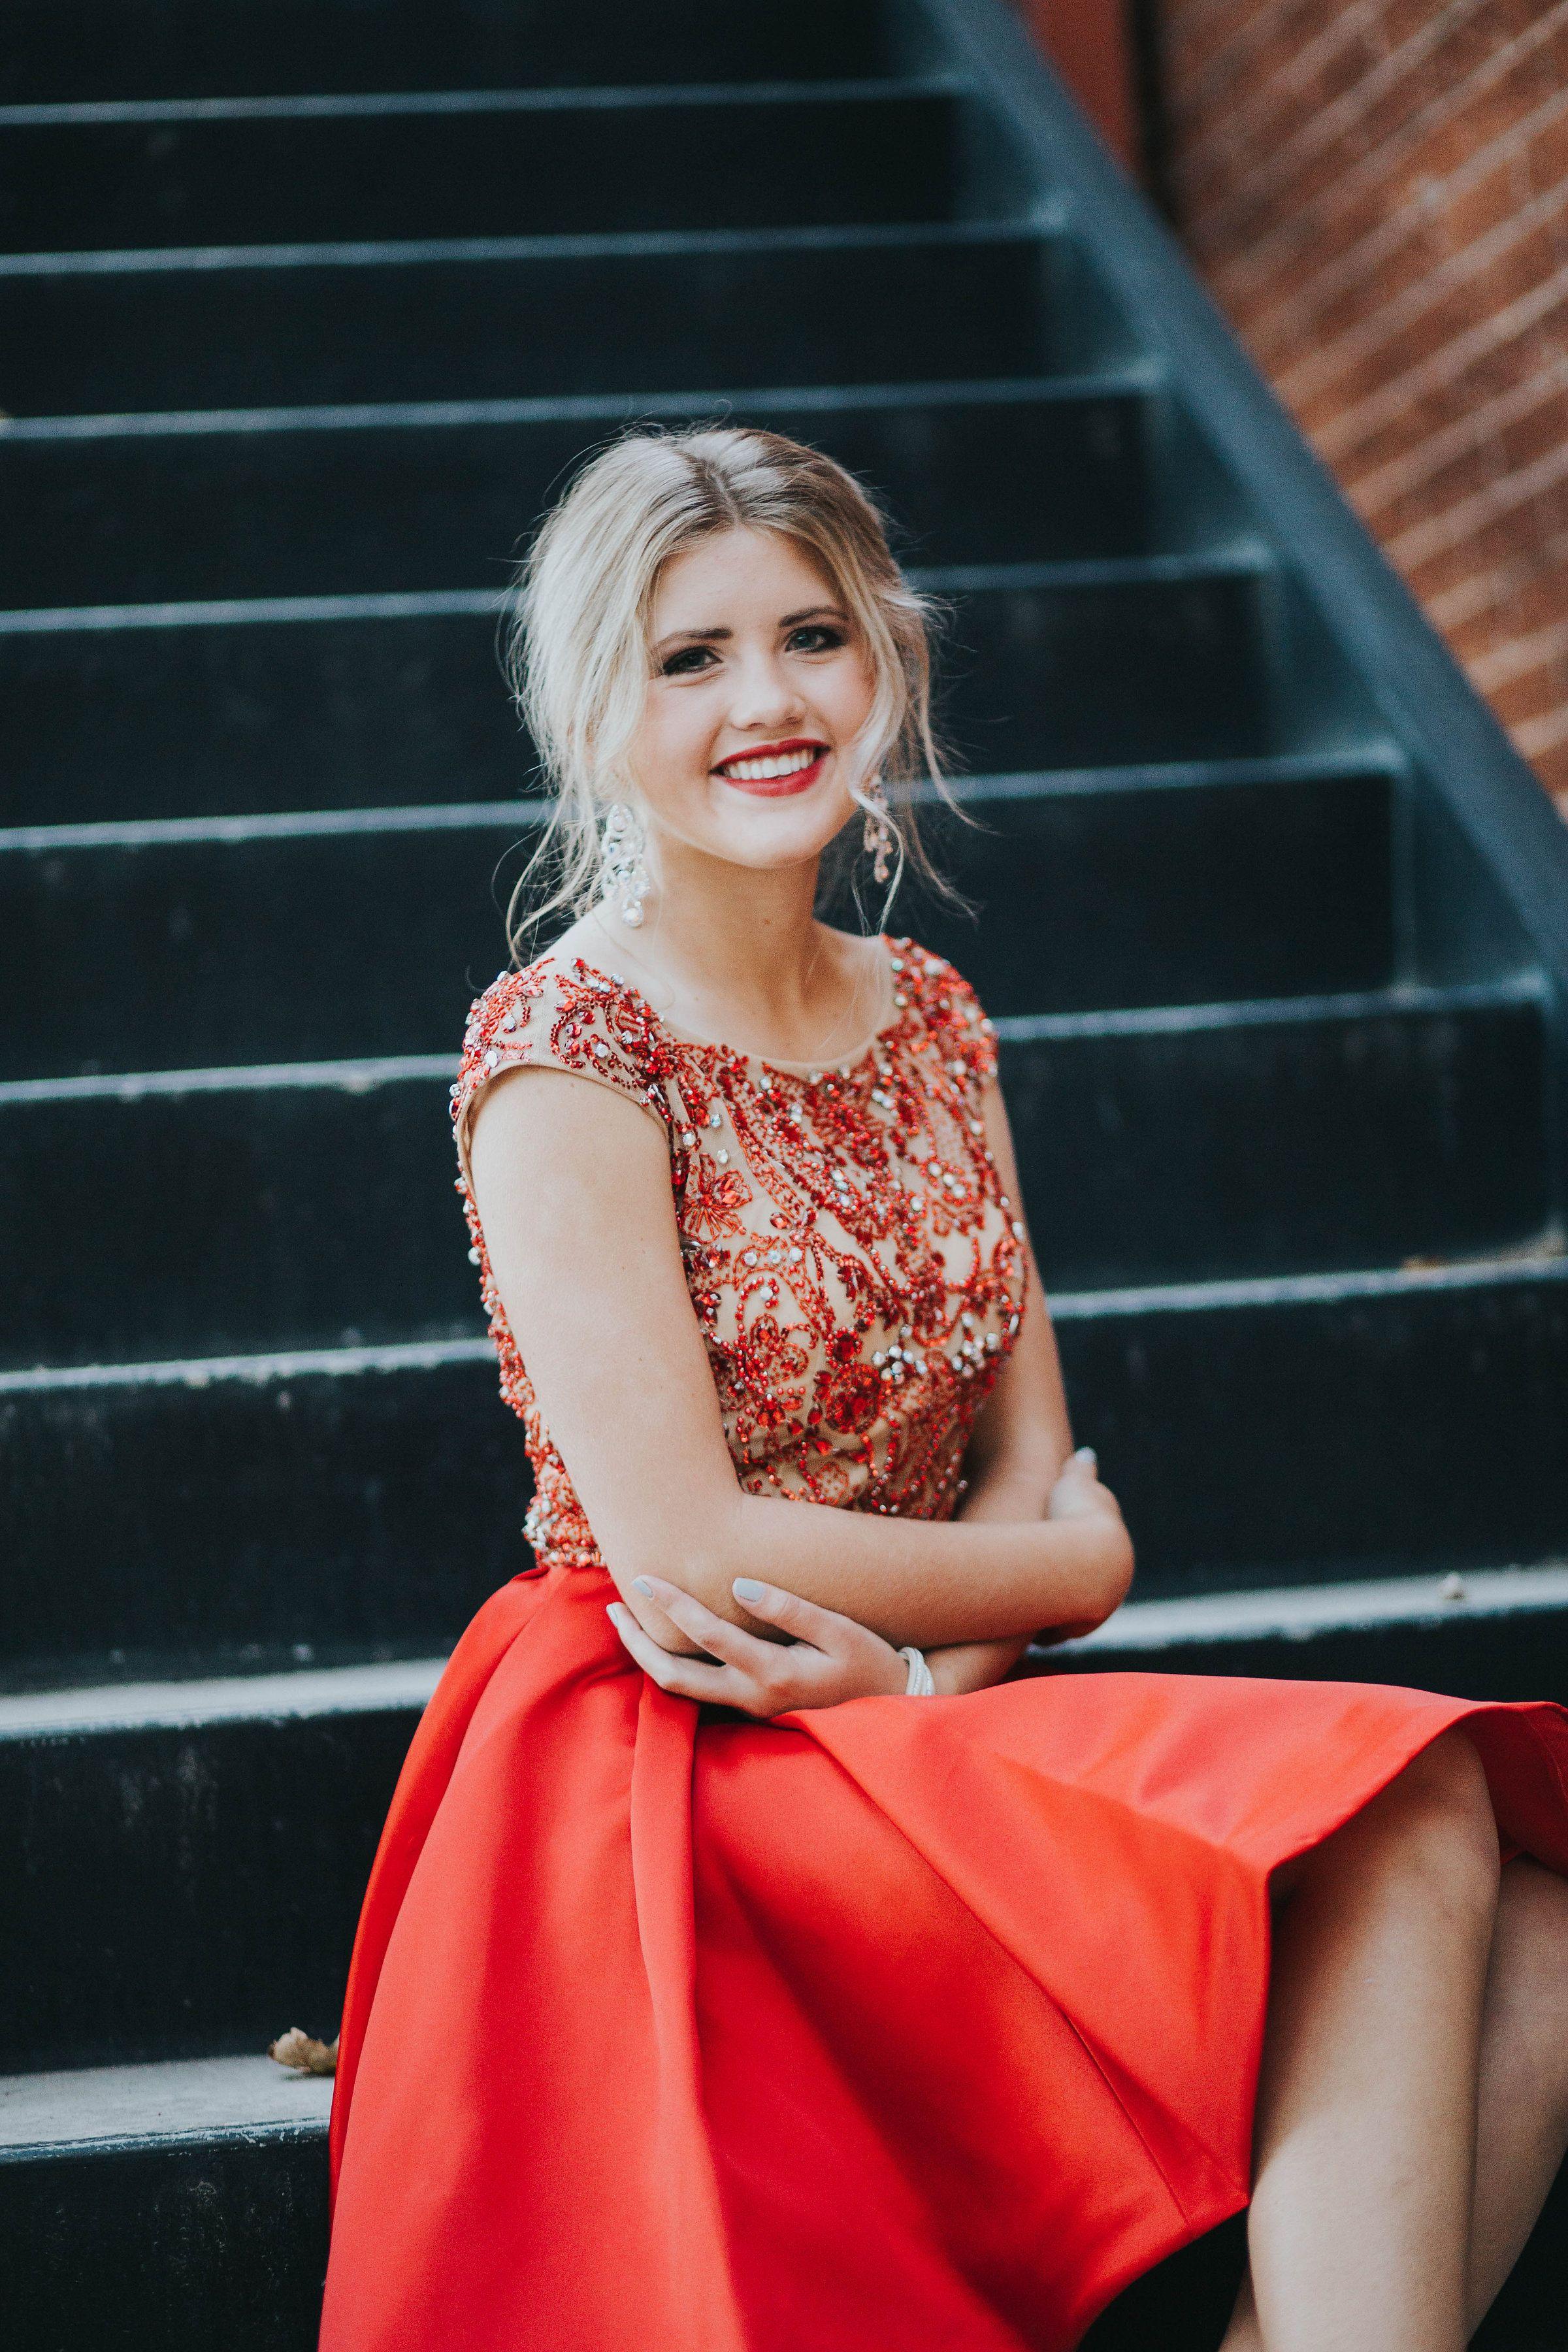 Utah Homecoming Homecoming Dress Short dress formal event ...